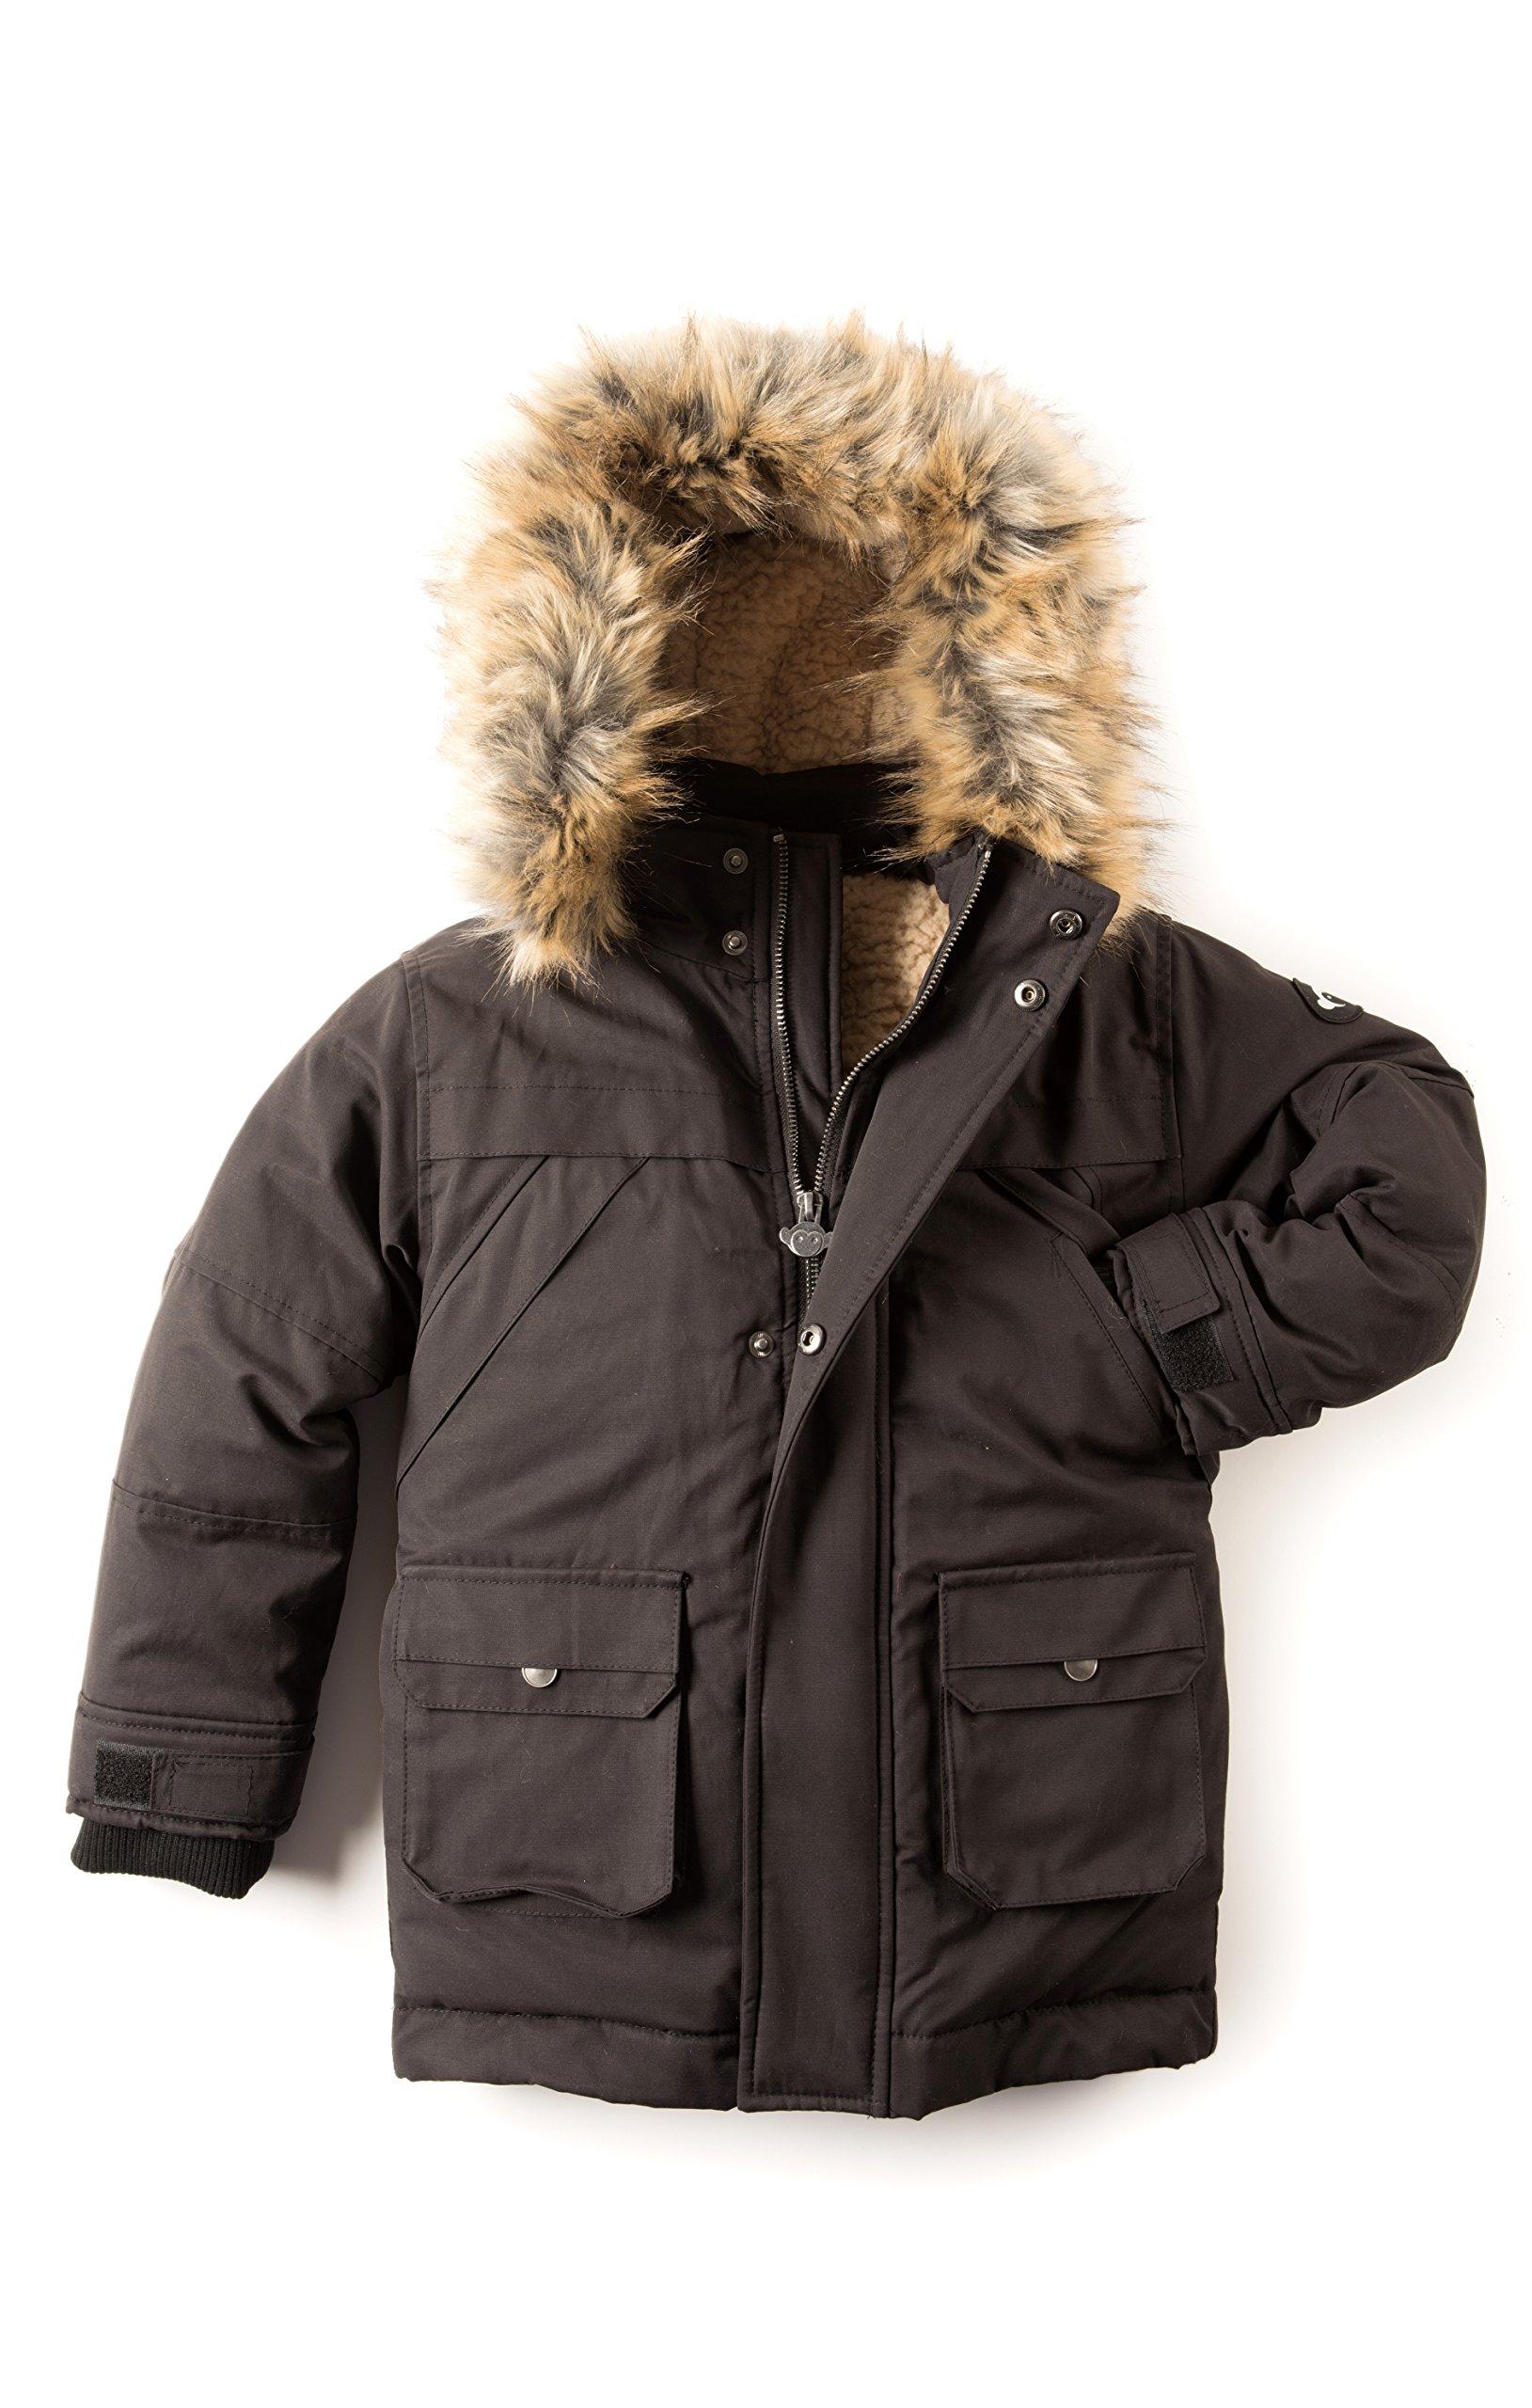 Appaman Little Boys' Denali Down Coat, Black, 6